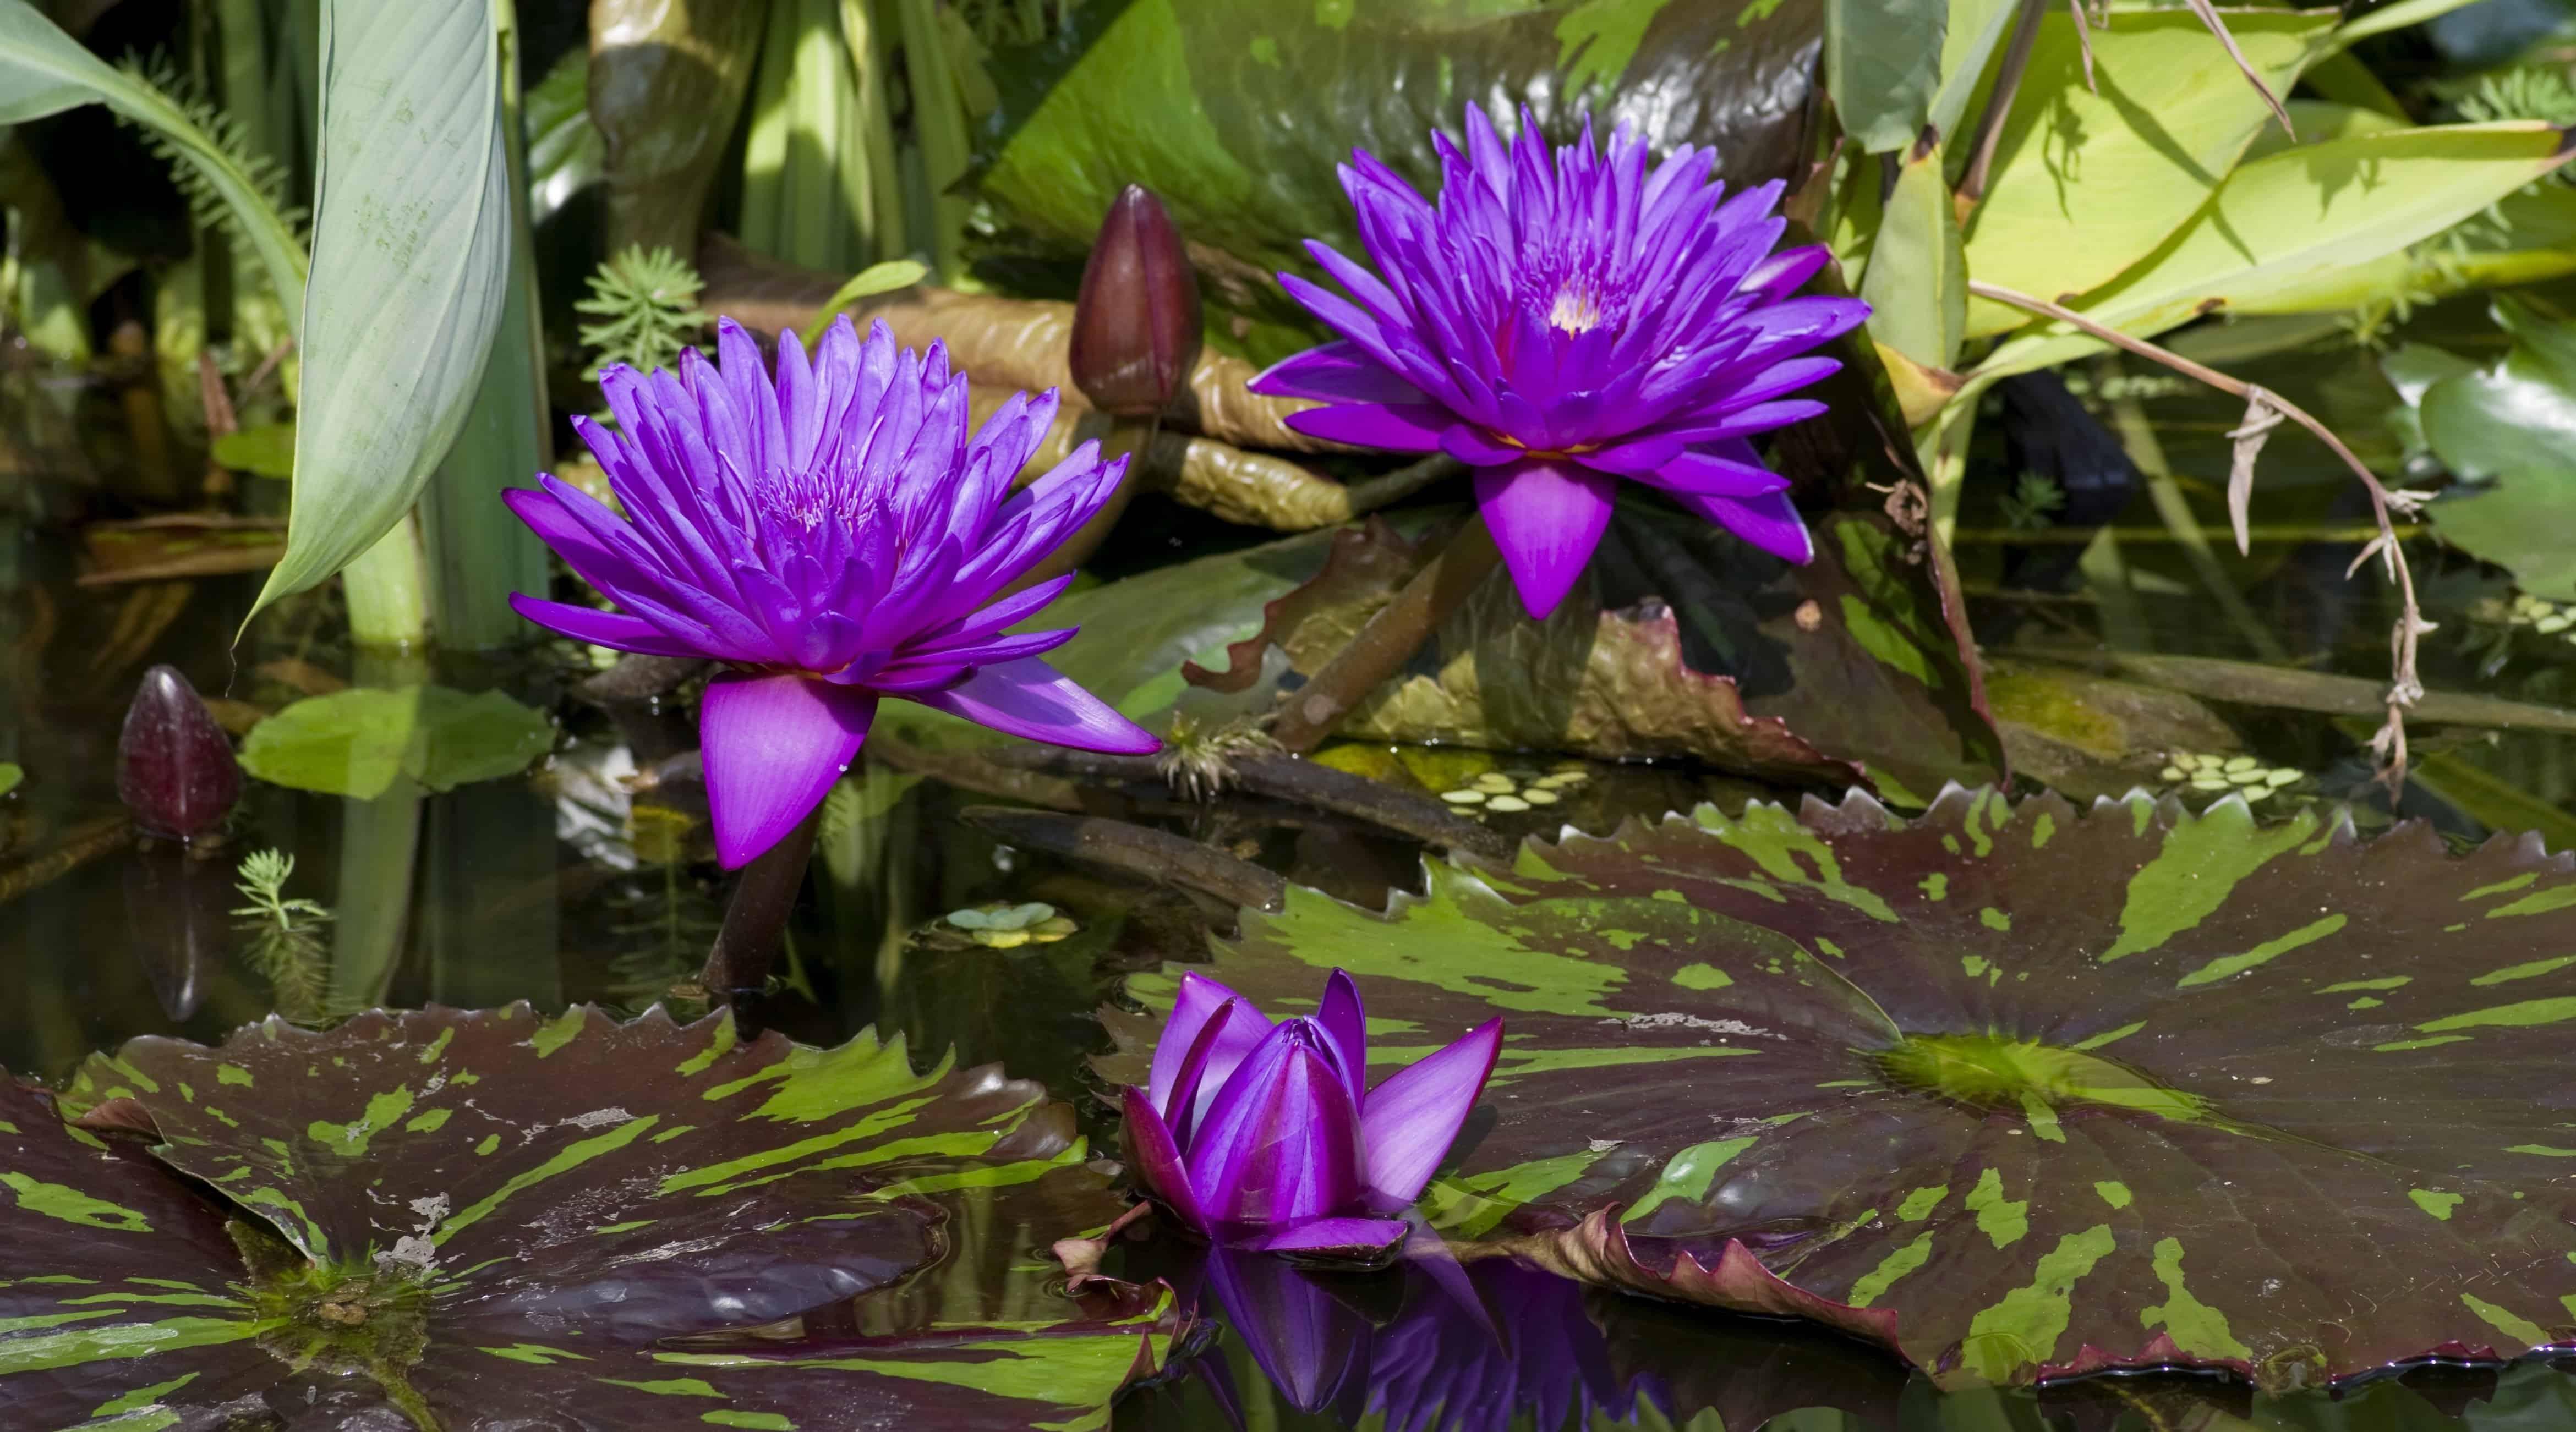 Imagen Gratis P Talo Jard N Flora Nen Far Flor Naturaleza  # Muebles Nenufar